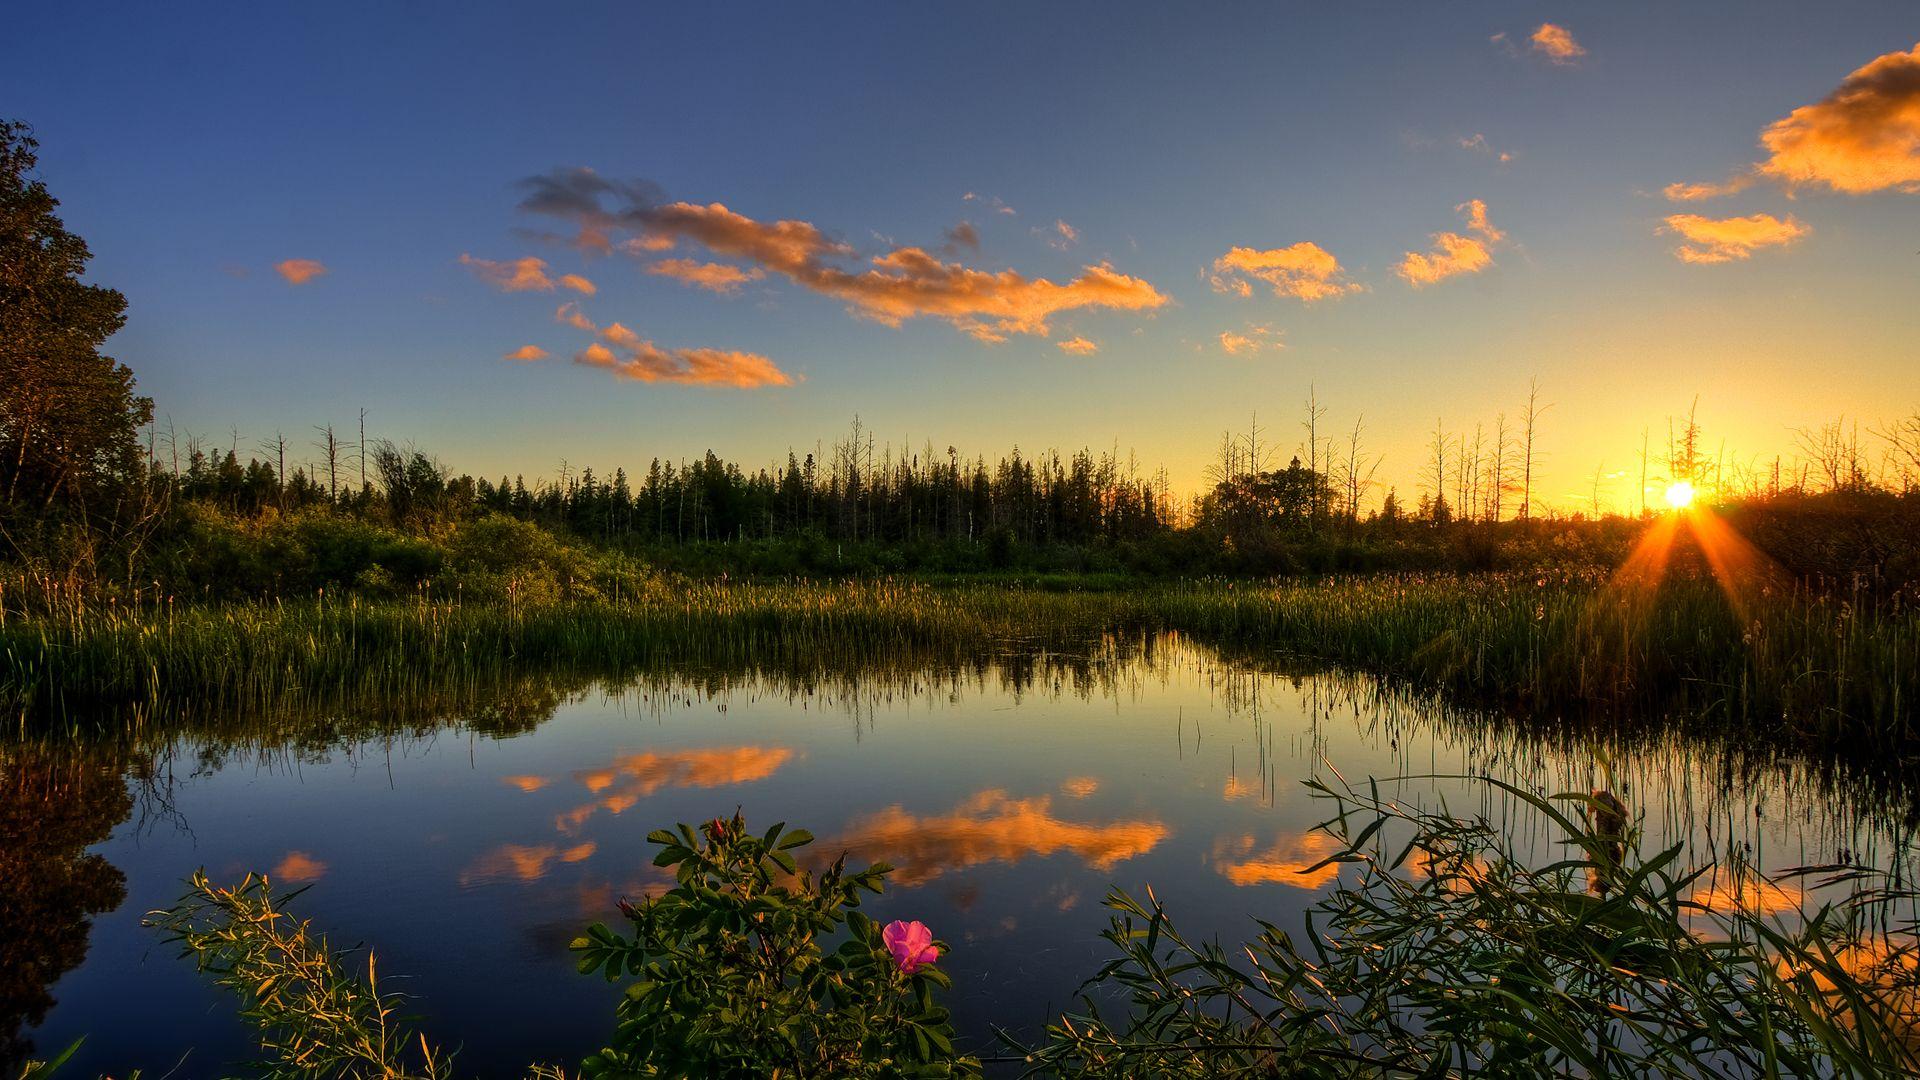 Amazing Pond Wallpaper